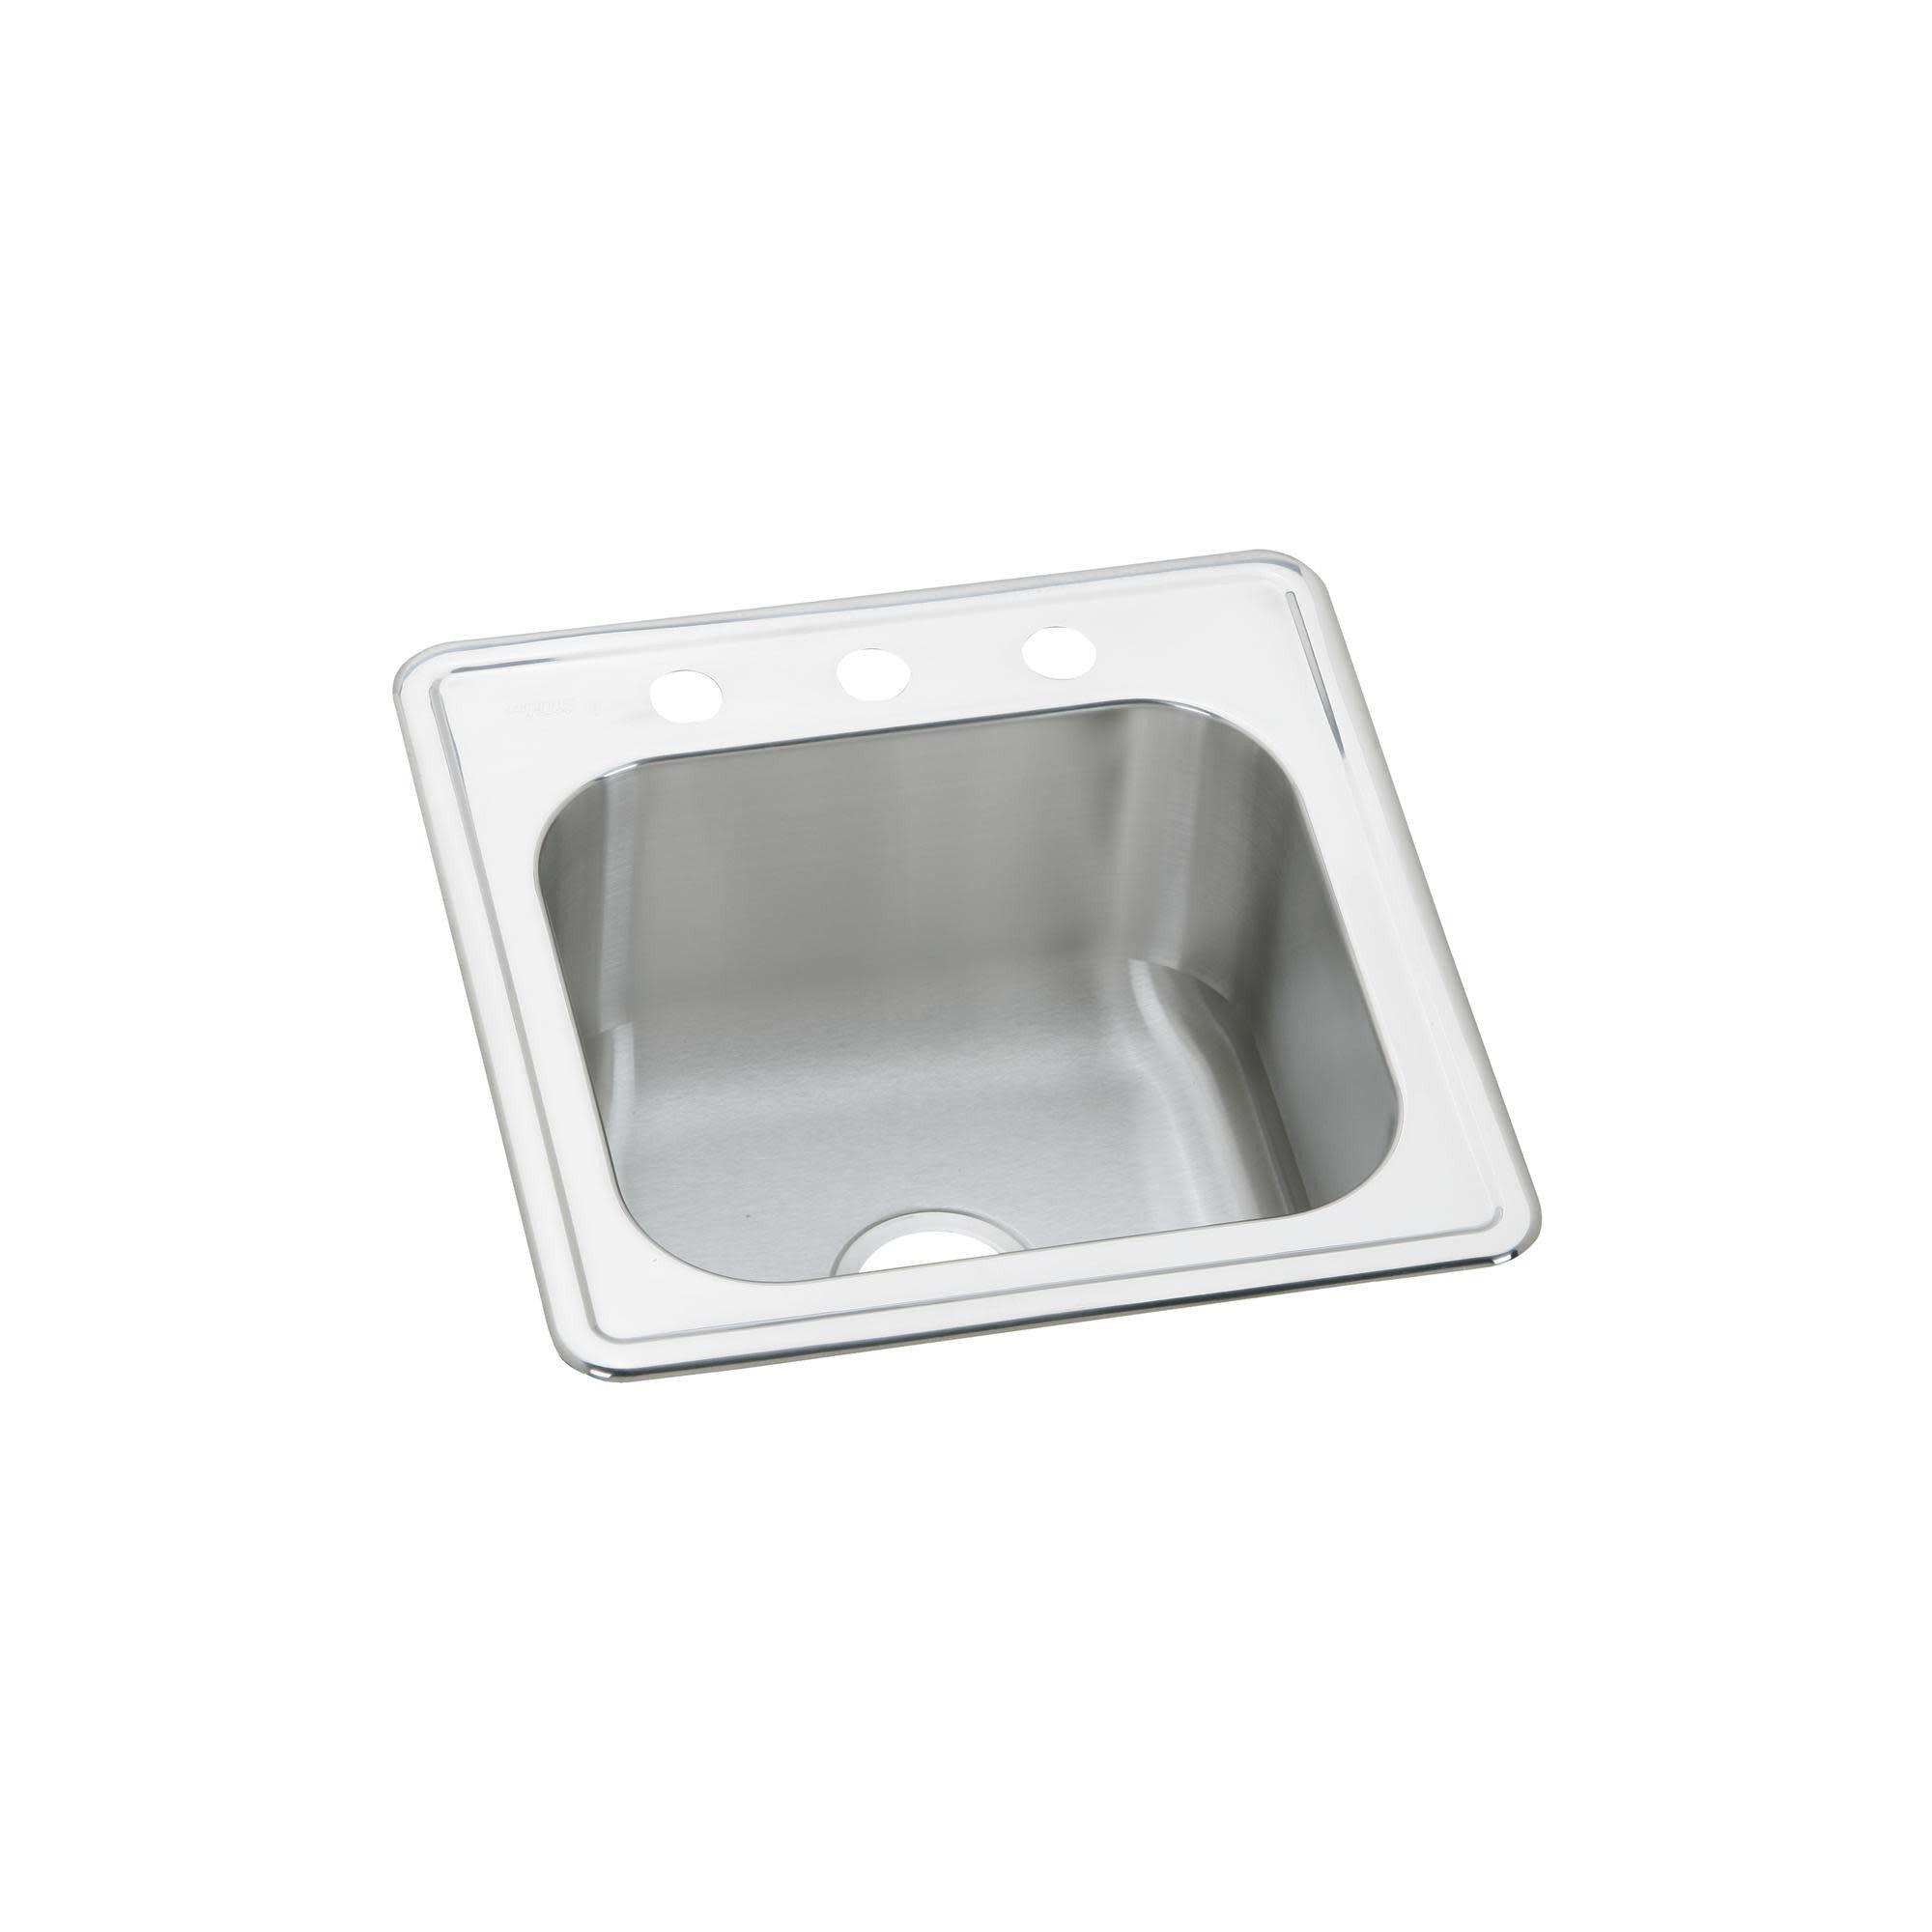 Elkay Ese202010 Gourmet 20 Single Basin 20 Gauge Stainless Steel Kitchen Sink For Drop In Installations 3 Faucet Holes Stainless Steel Kitchen Elkay Sinks Faucet